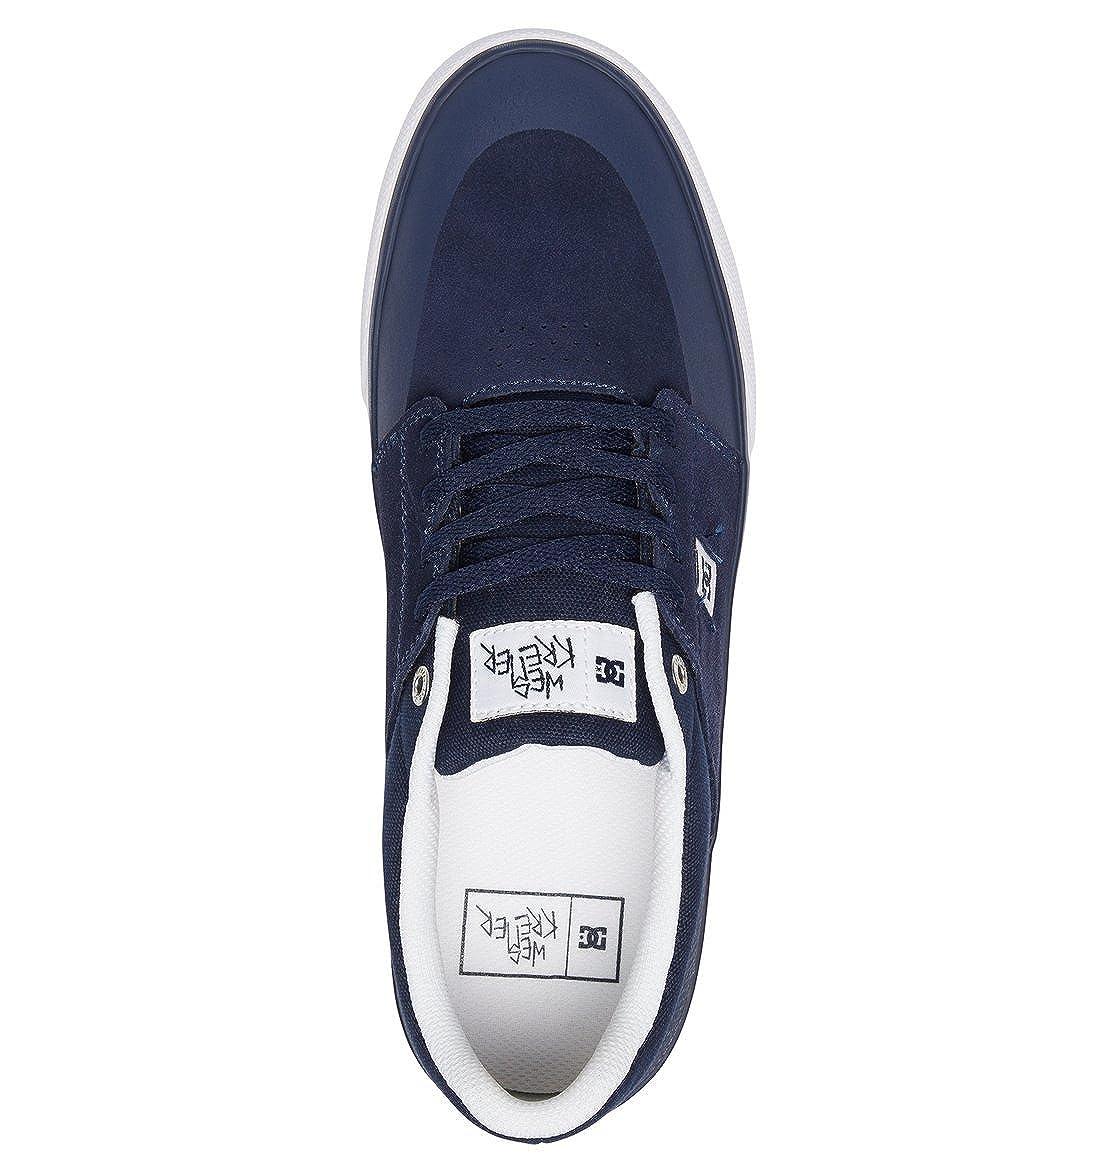 DC DC DC schuhe Wes Kremer - Schuhe für Männer ADYS300315  e36fa5